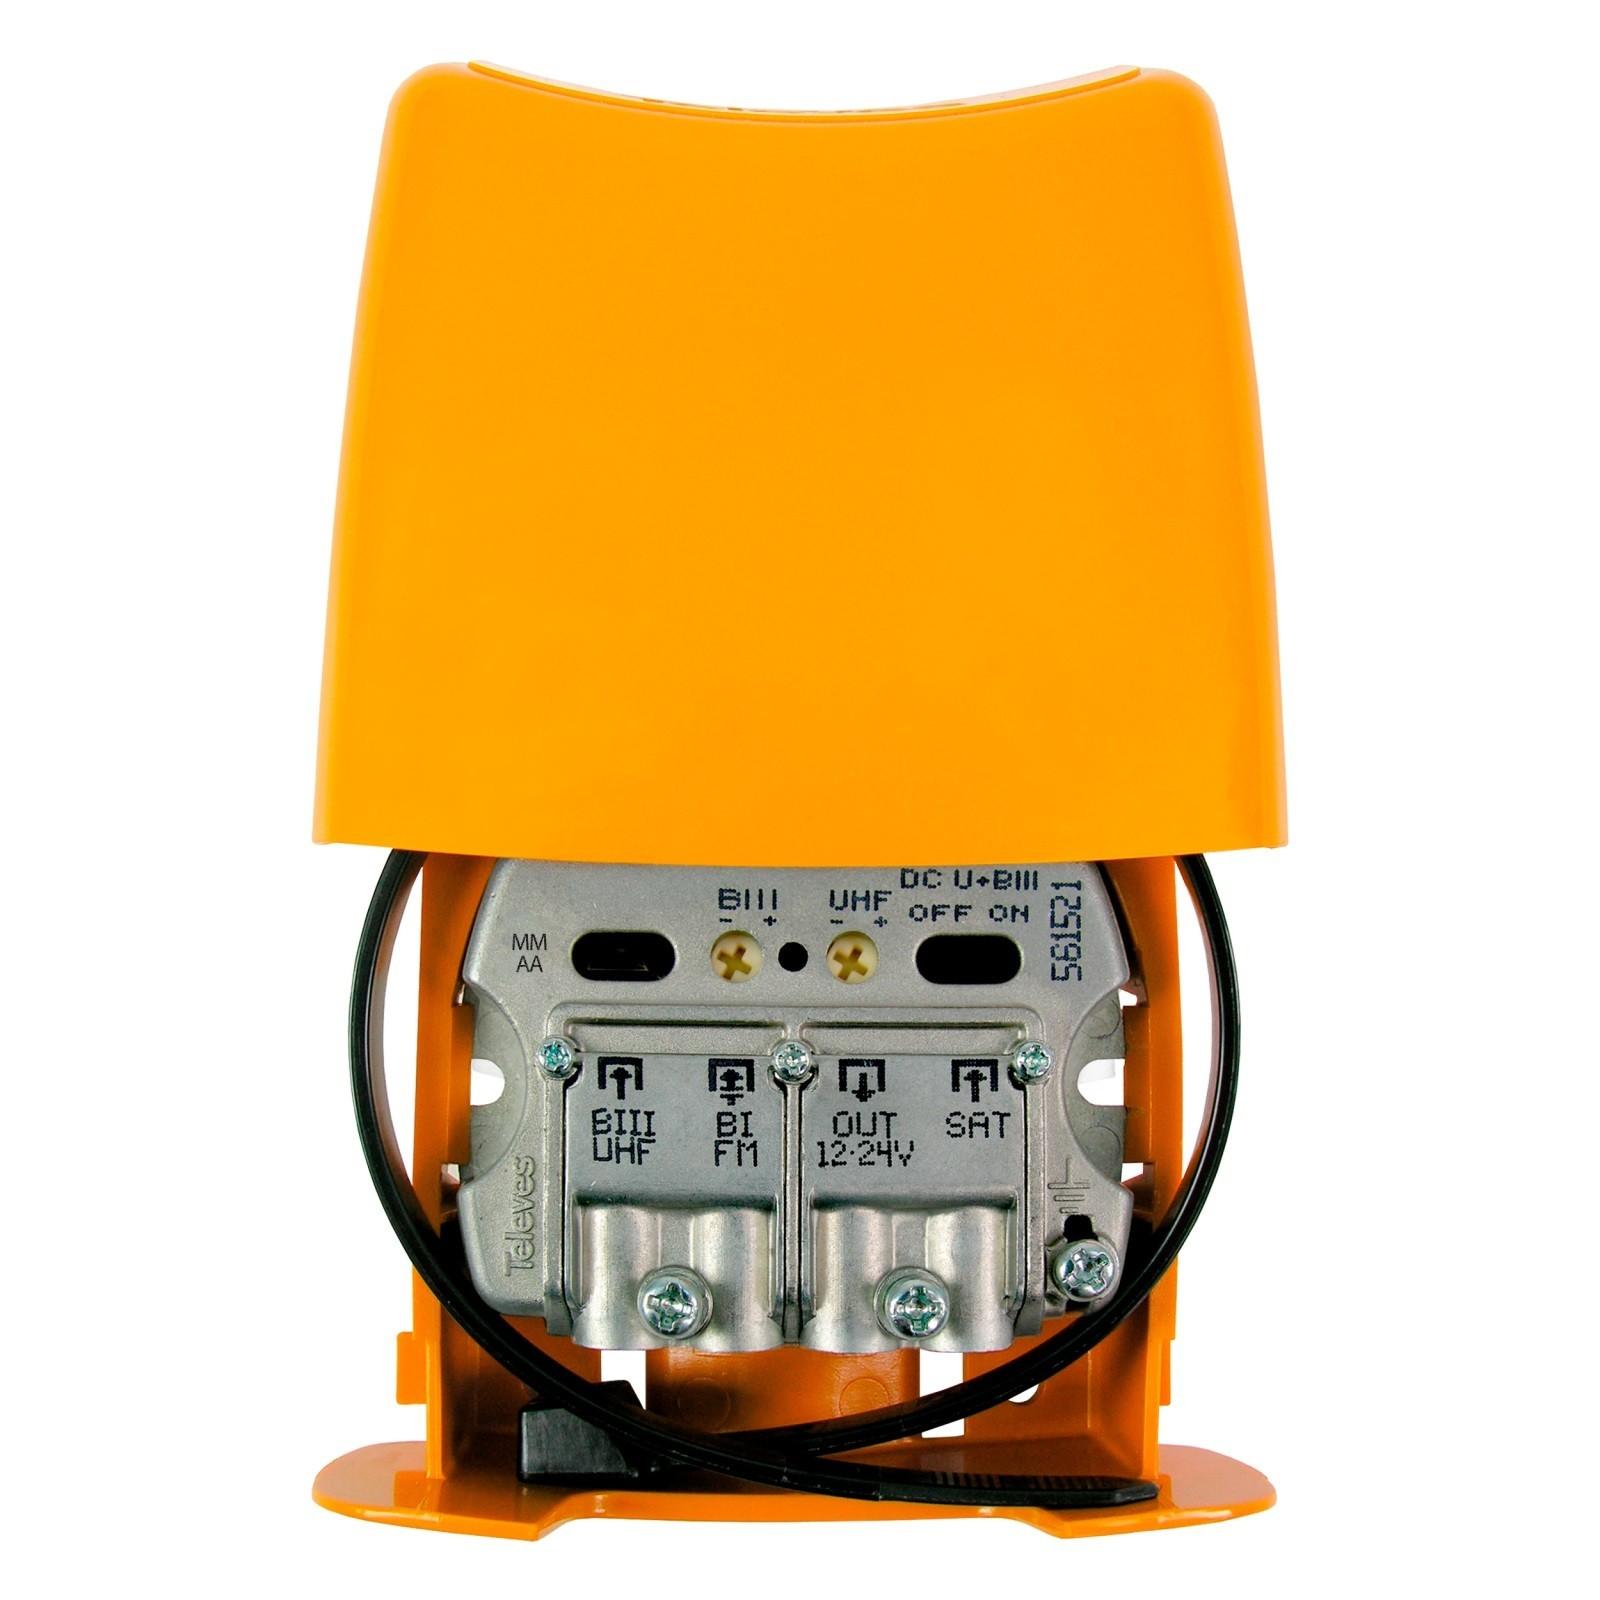 Amplificador de mástil 5G, 3 Entradas. UHF / FM / Mezcla SAT, 28dB, ajustable 15dB,108/106dBuV